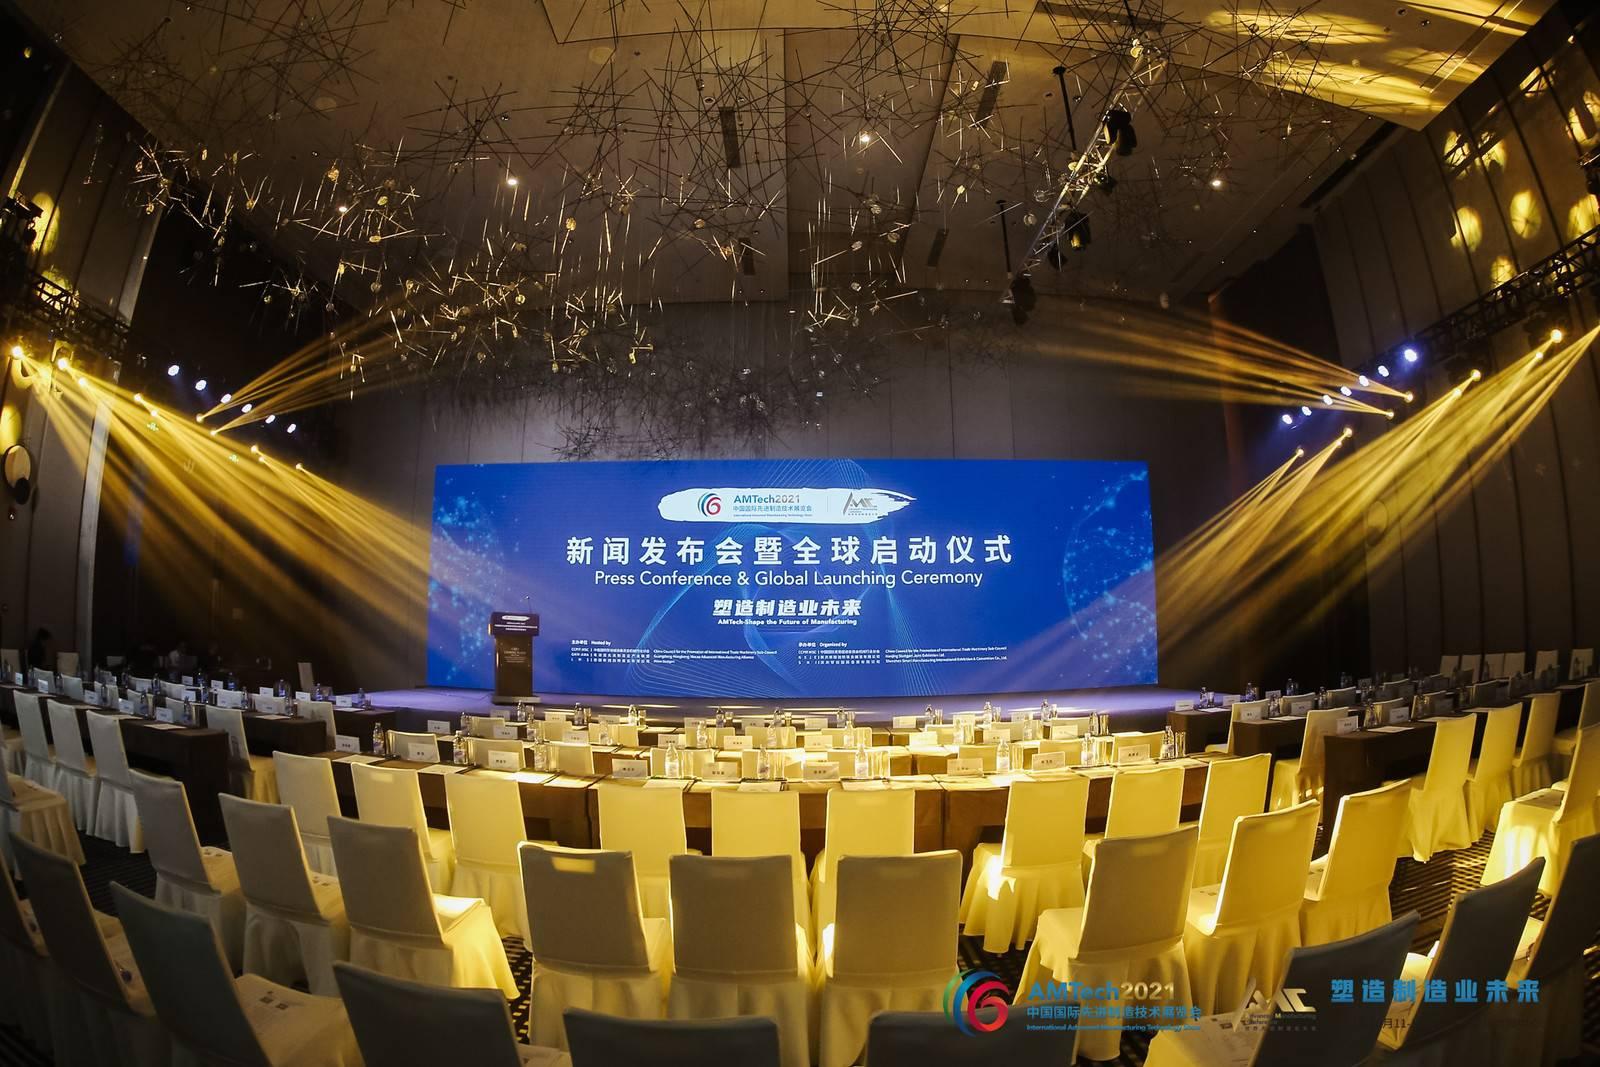 AMTech & AMC2021新聞發布會暨全球啟動儀式9月2日在深圳成功召開